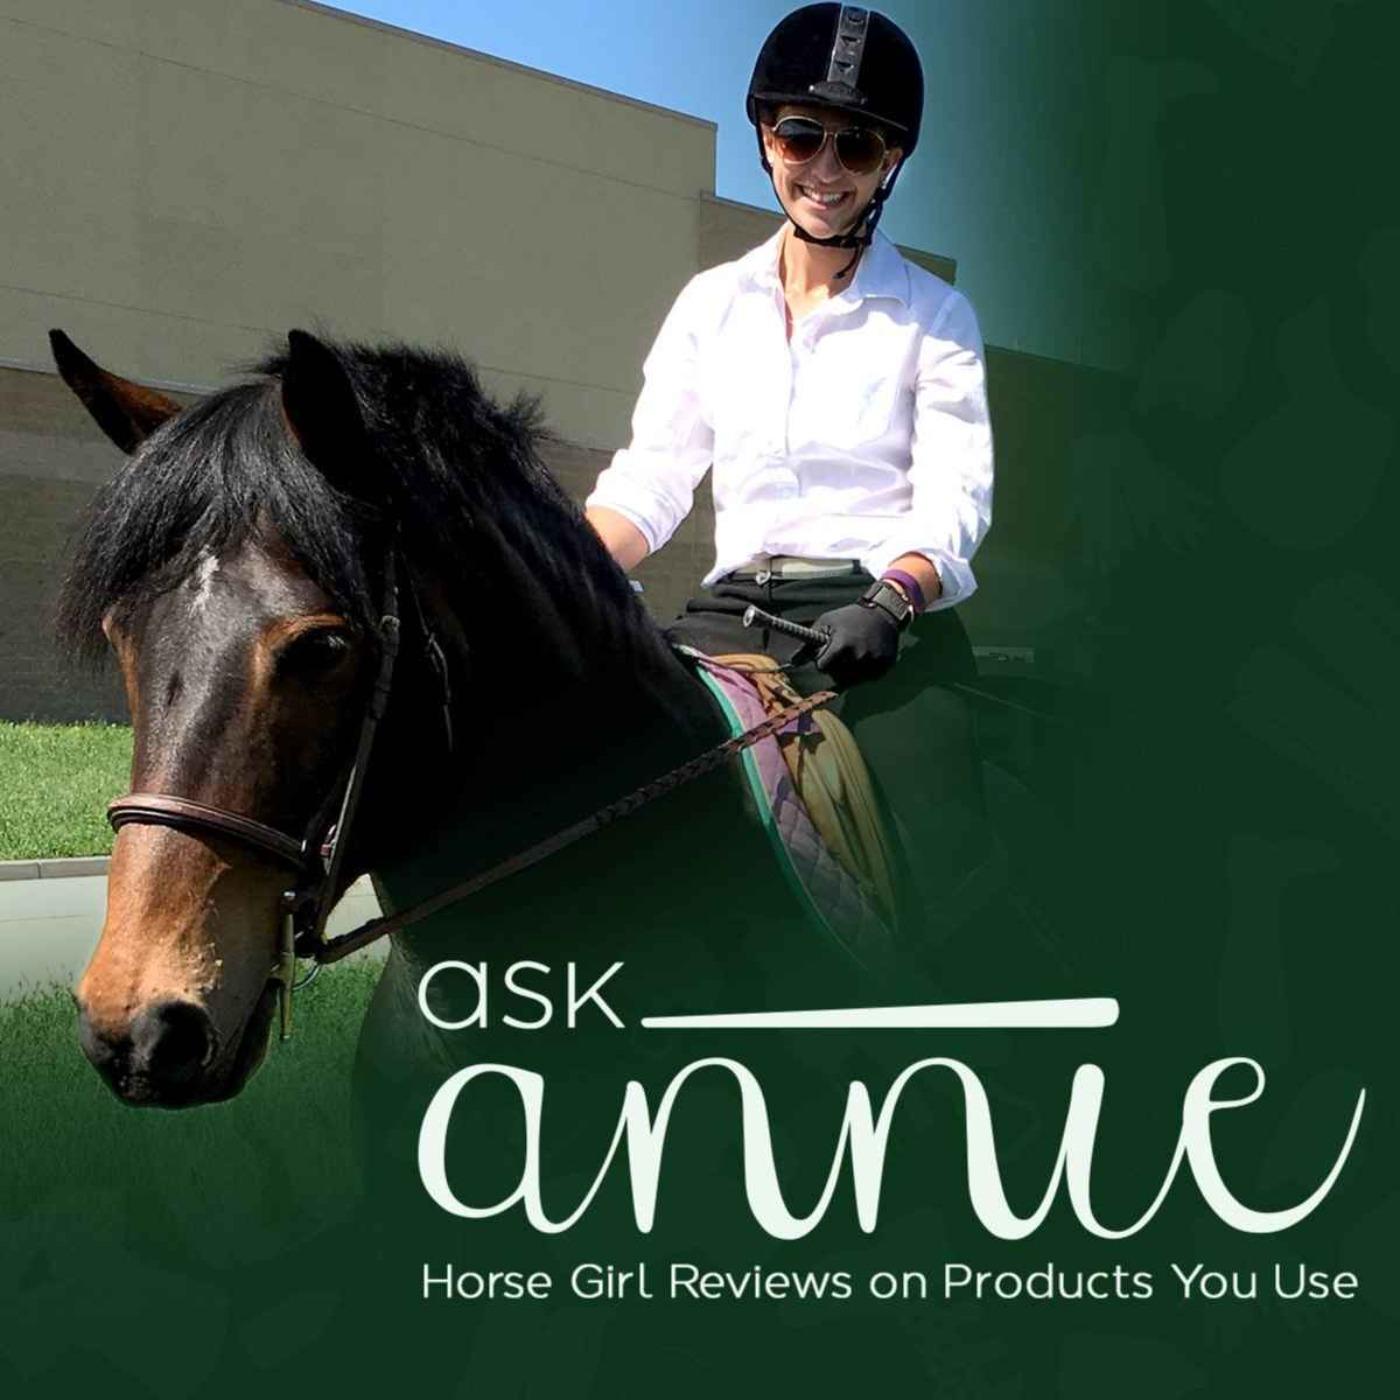 #AskAnnie - Episode 49: Hemp Horse Gold's Katie McNeal